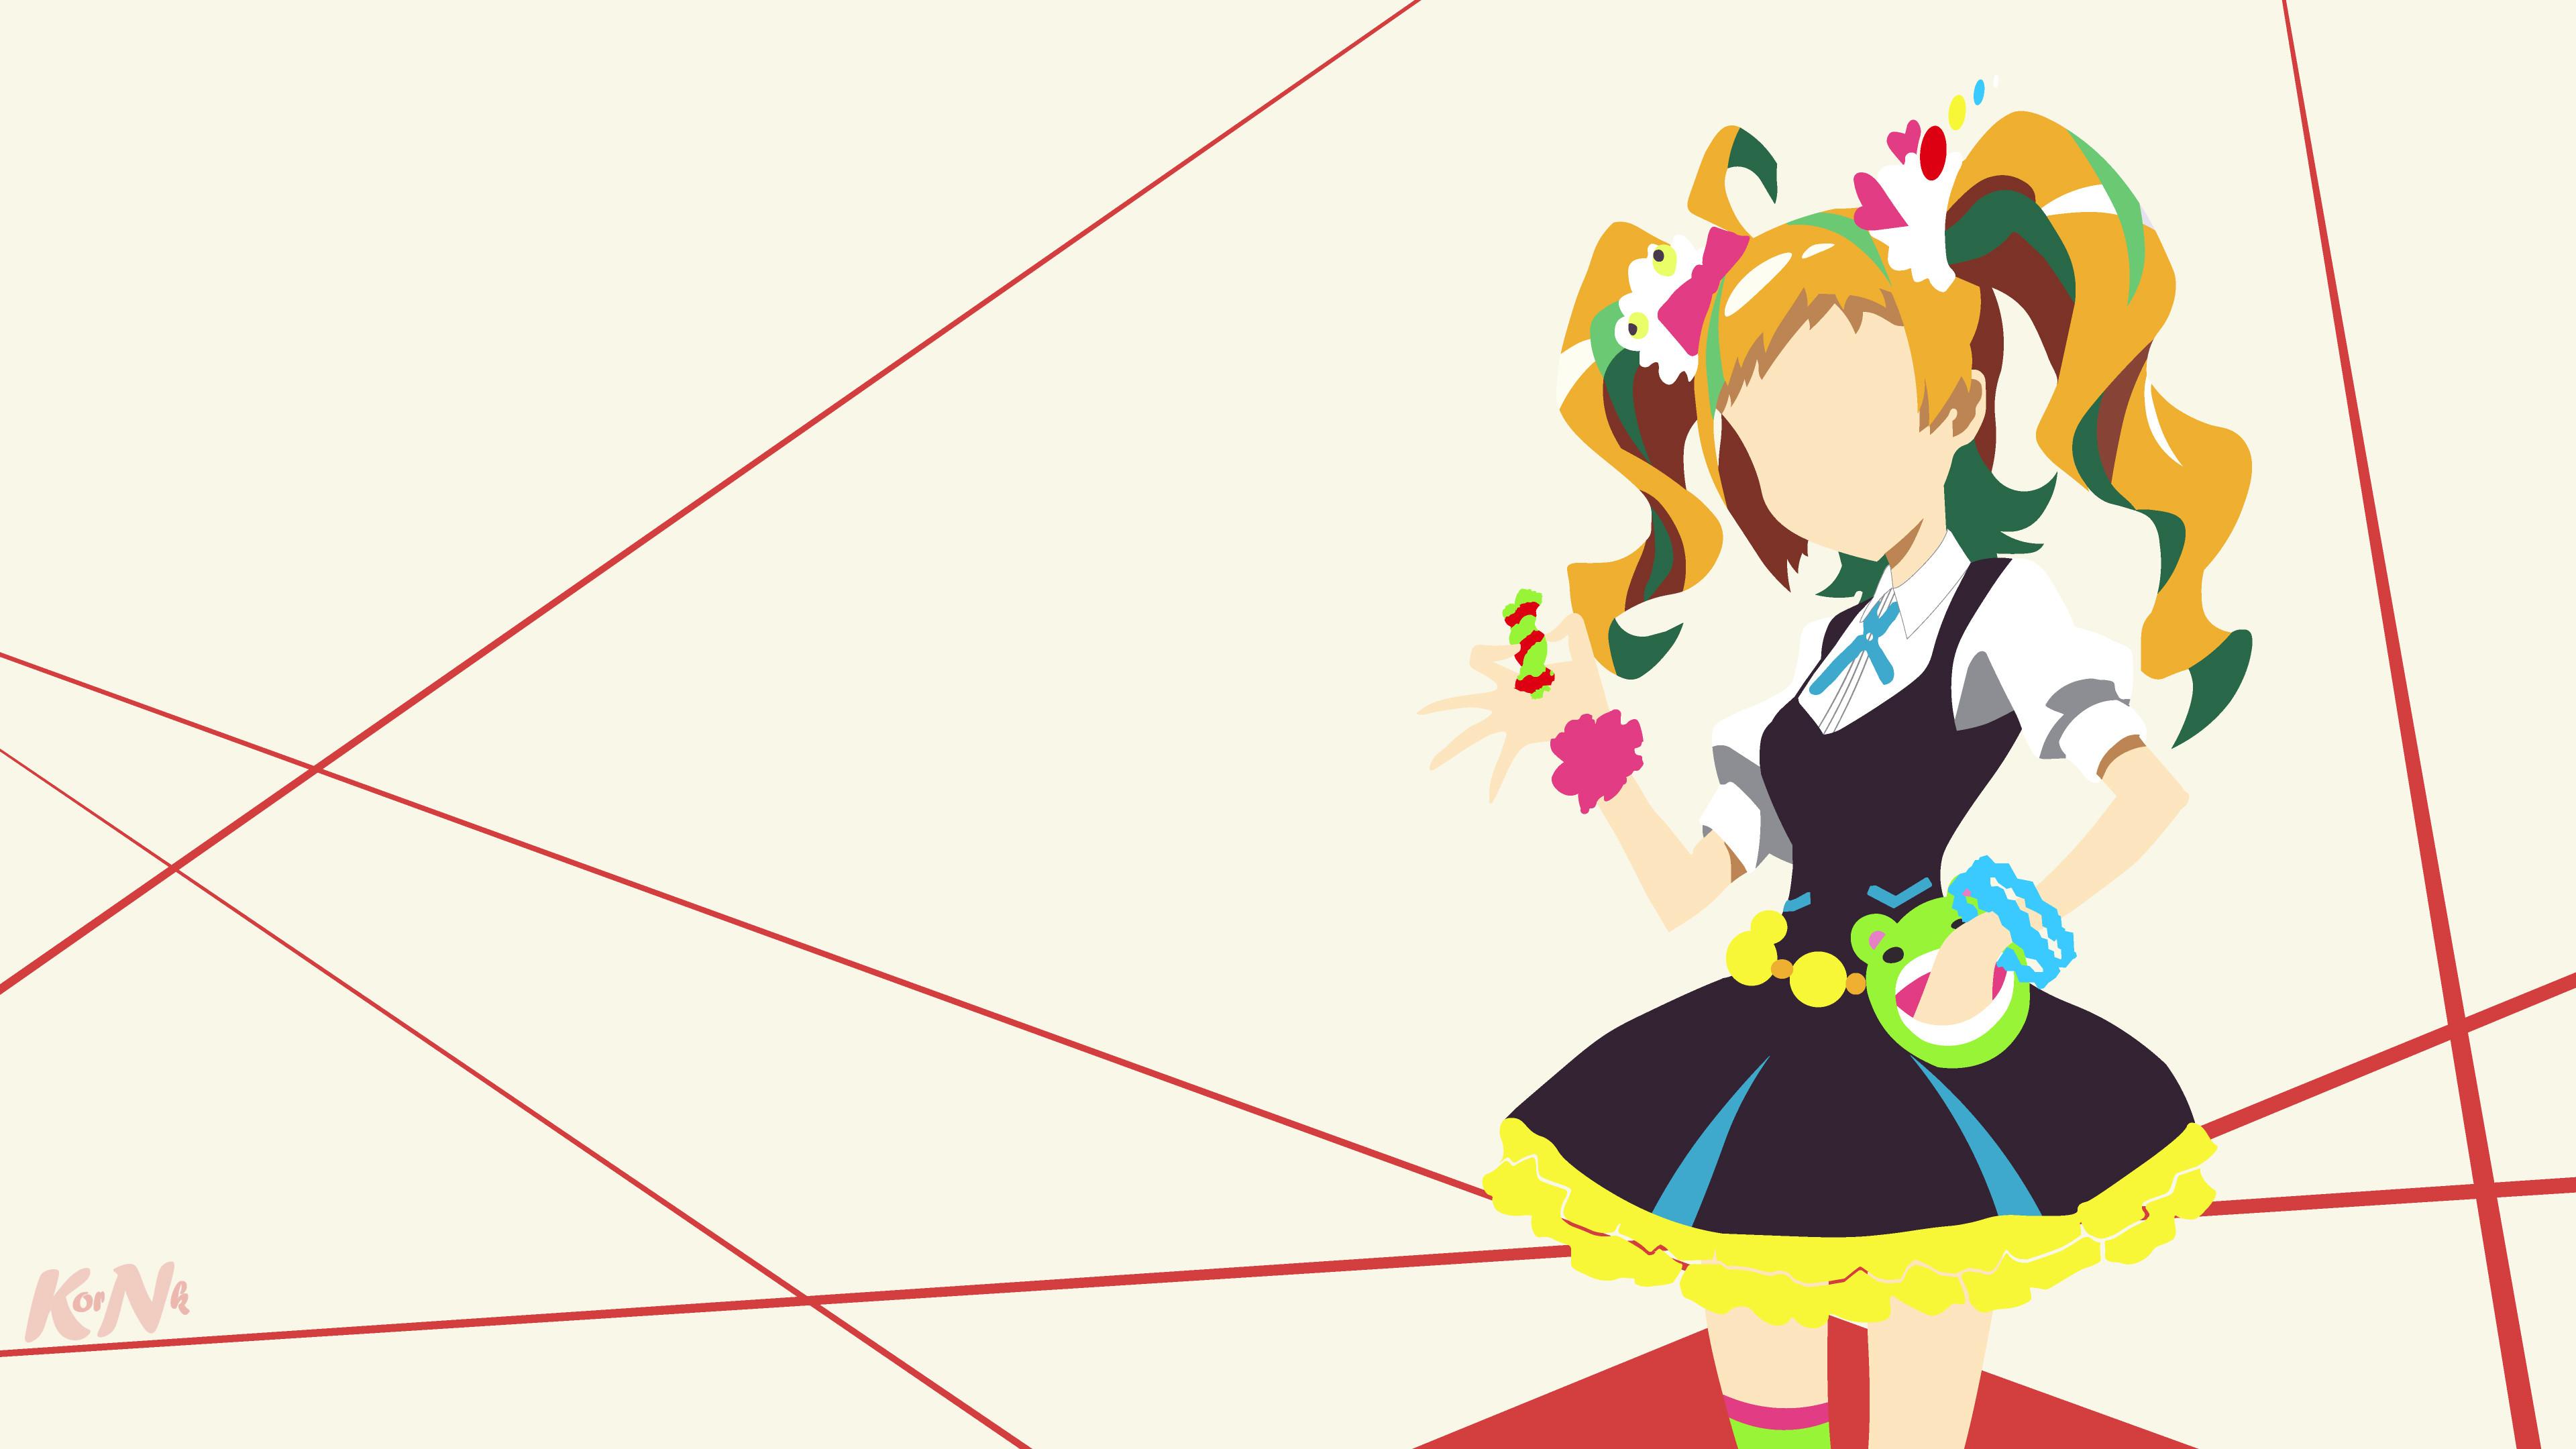 Nico – Kiznaiver by TheKorNk Nico – Kiznaiver by TheKorNk